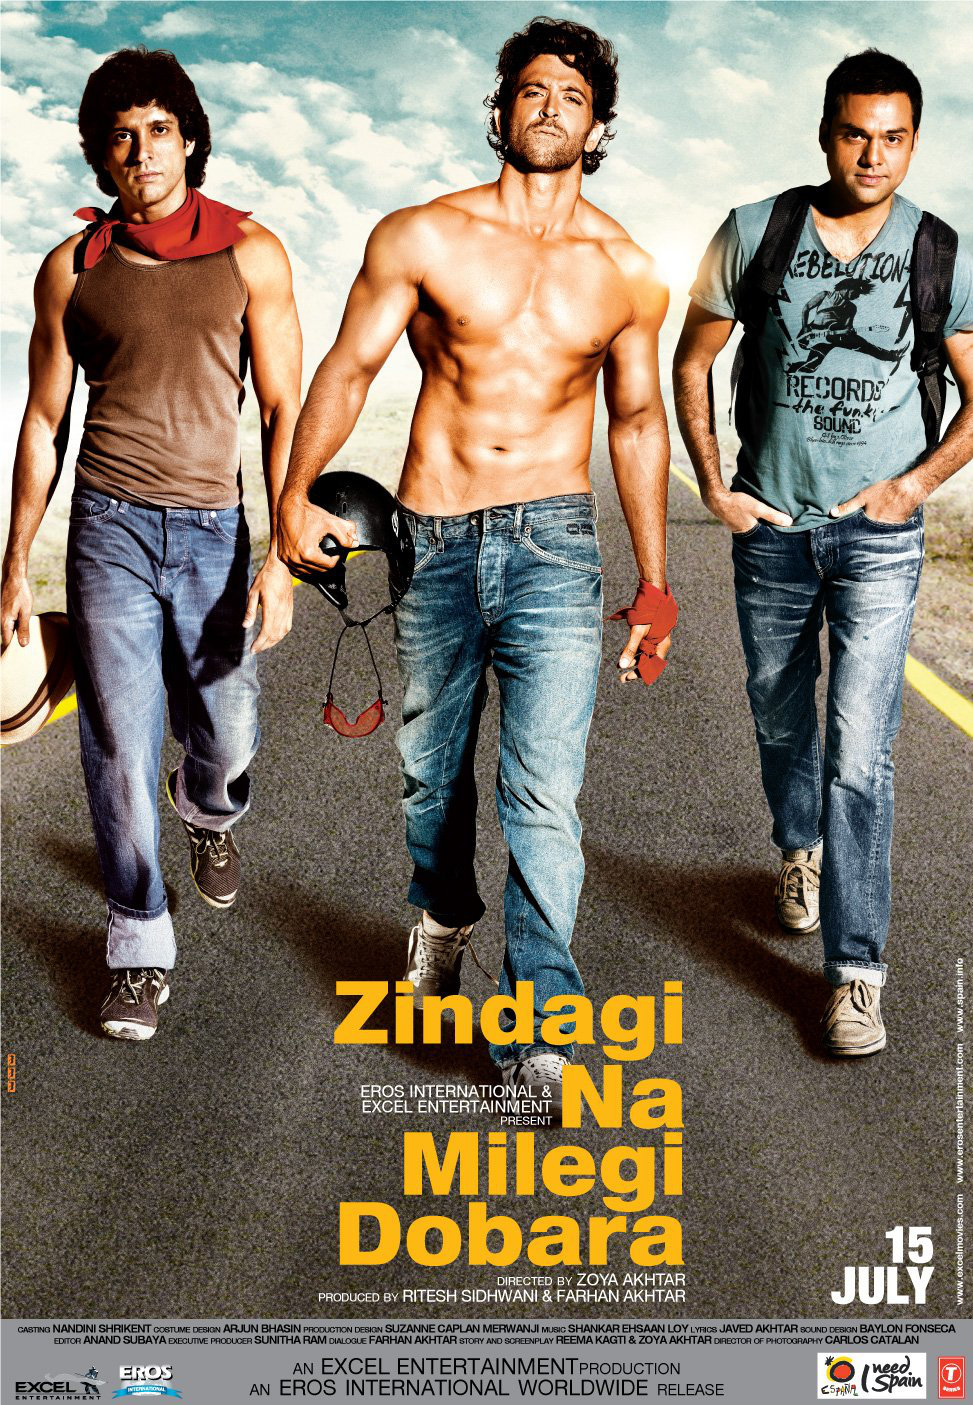 Zindagi Na Milegi Dobara Movie Poster Ft. Farhan Akhtar, Hrithik Roshan, Abhay Deol - Full HD Wallpaper